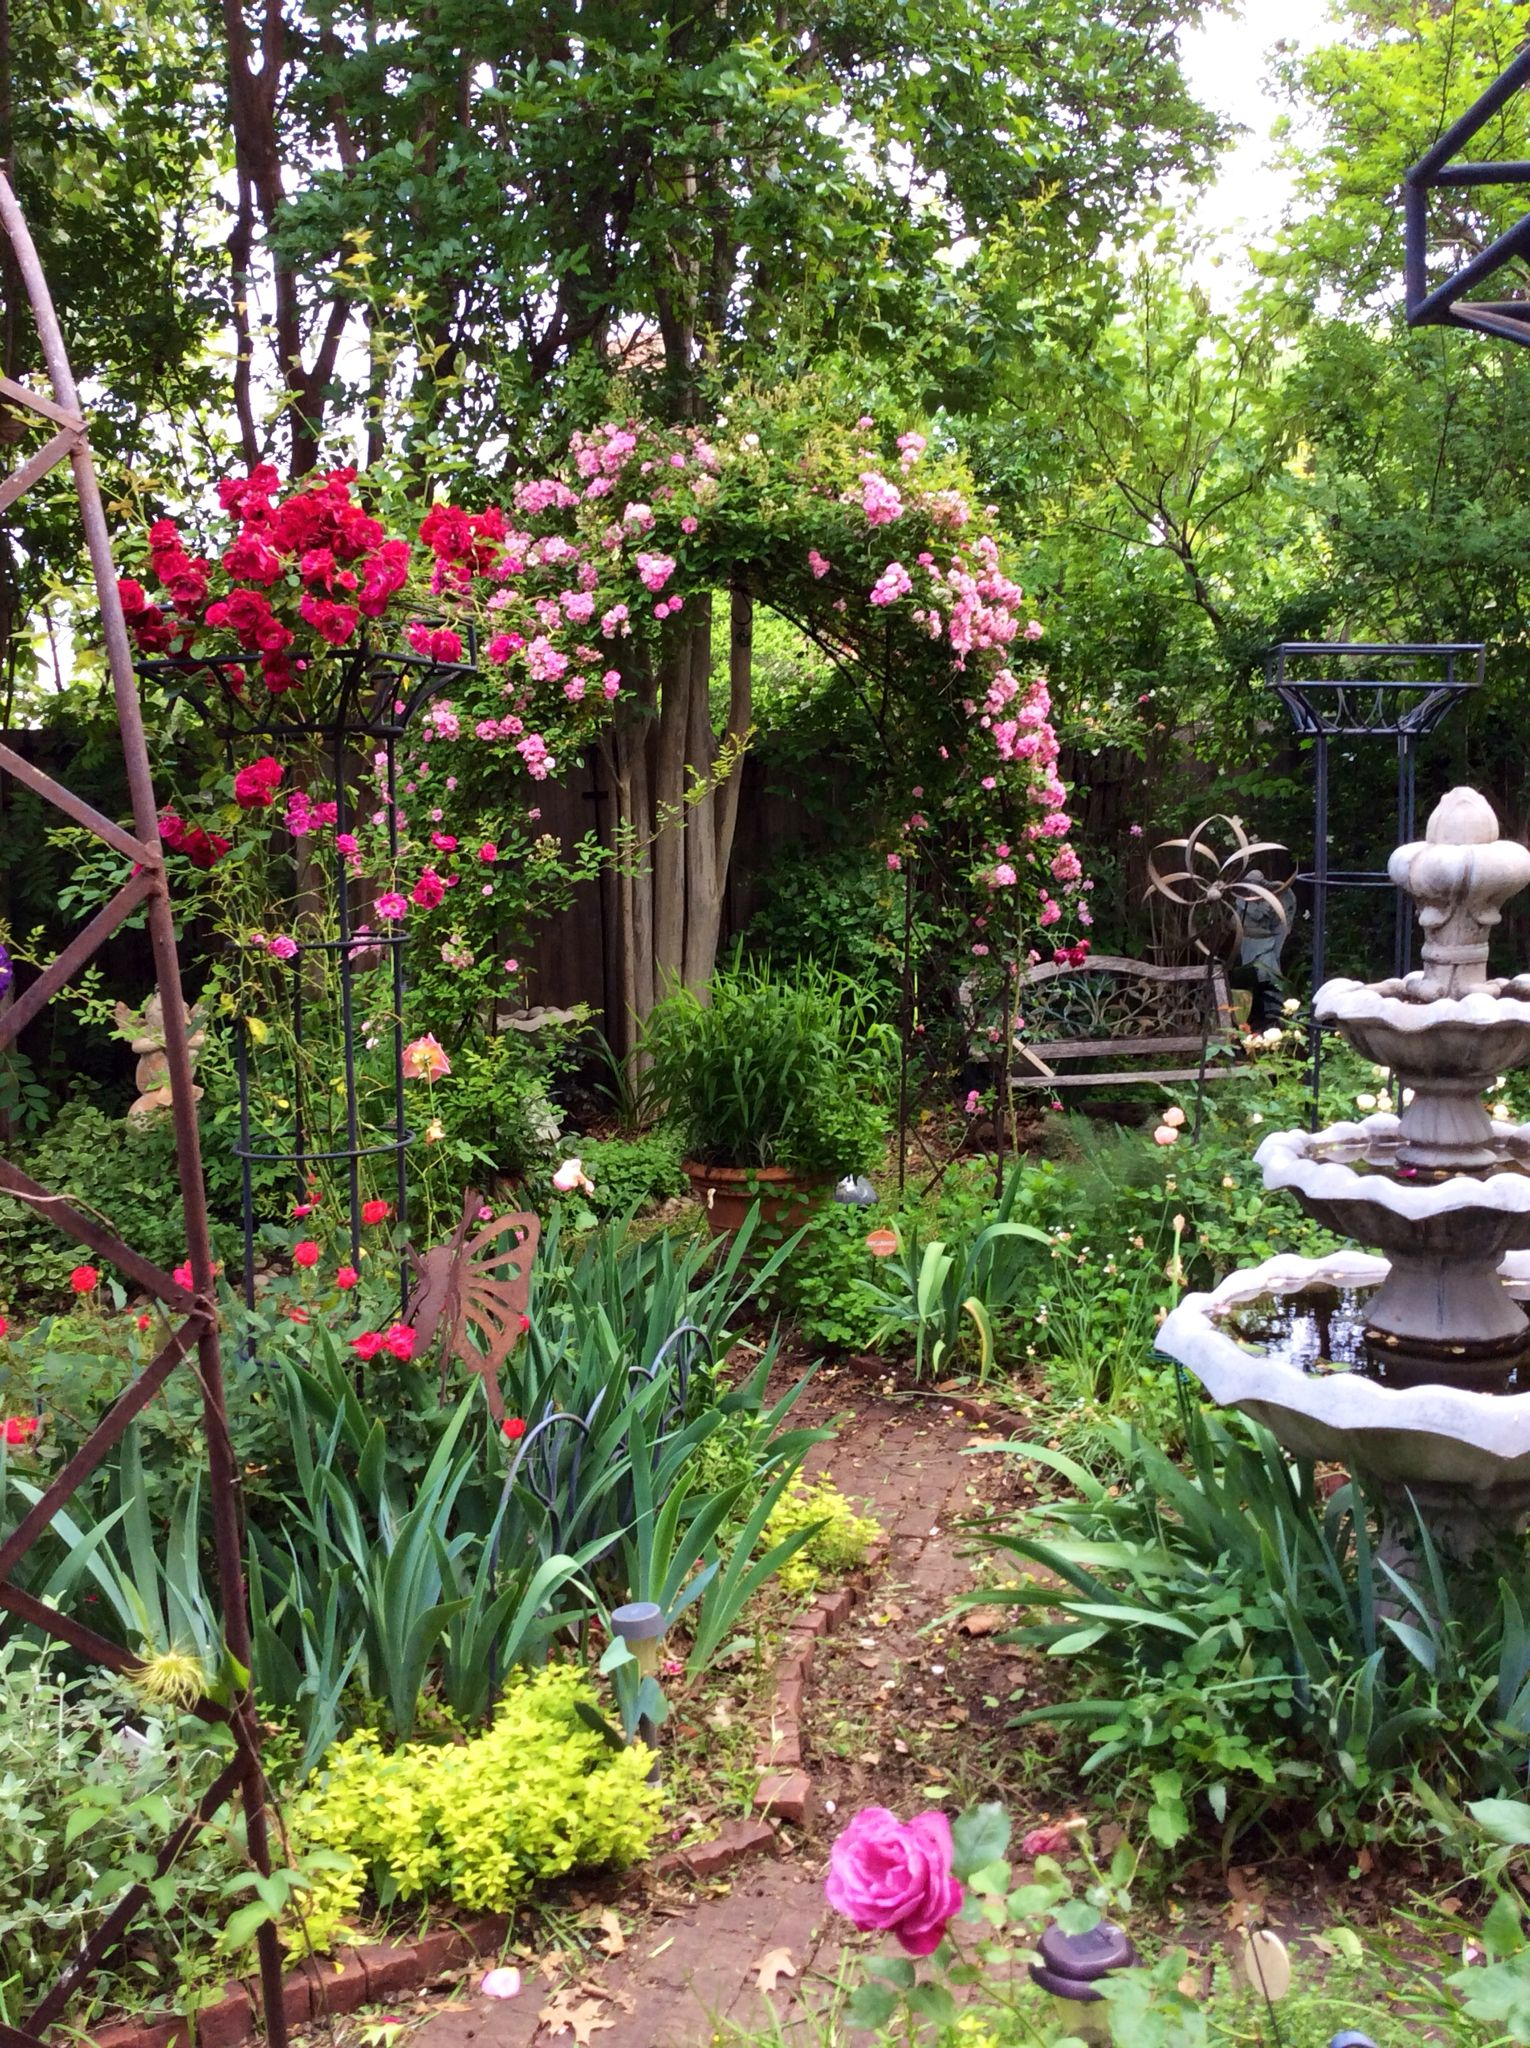 Herb garden roses (With images) Garden, Gardening for